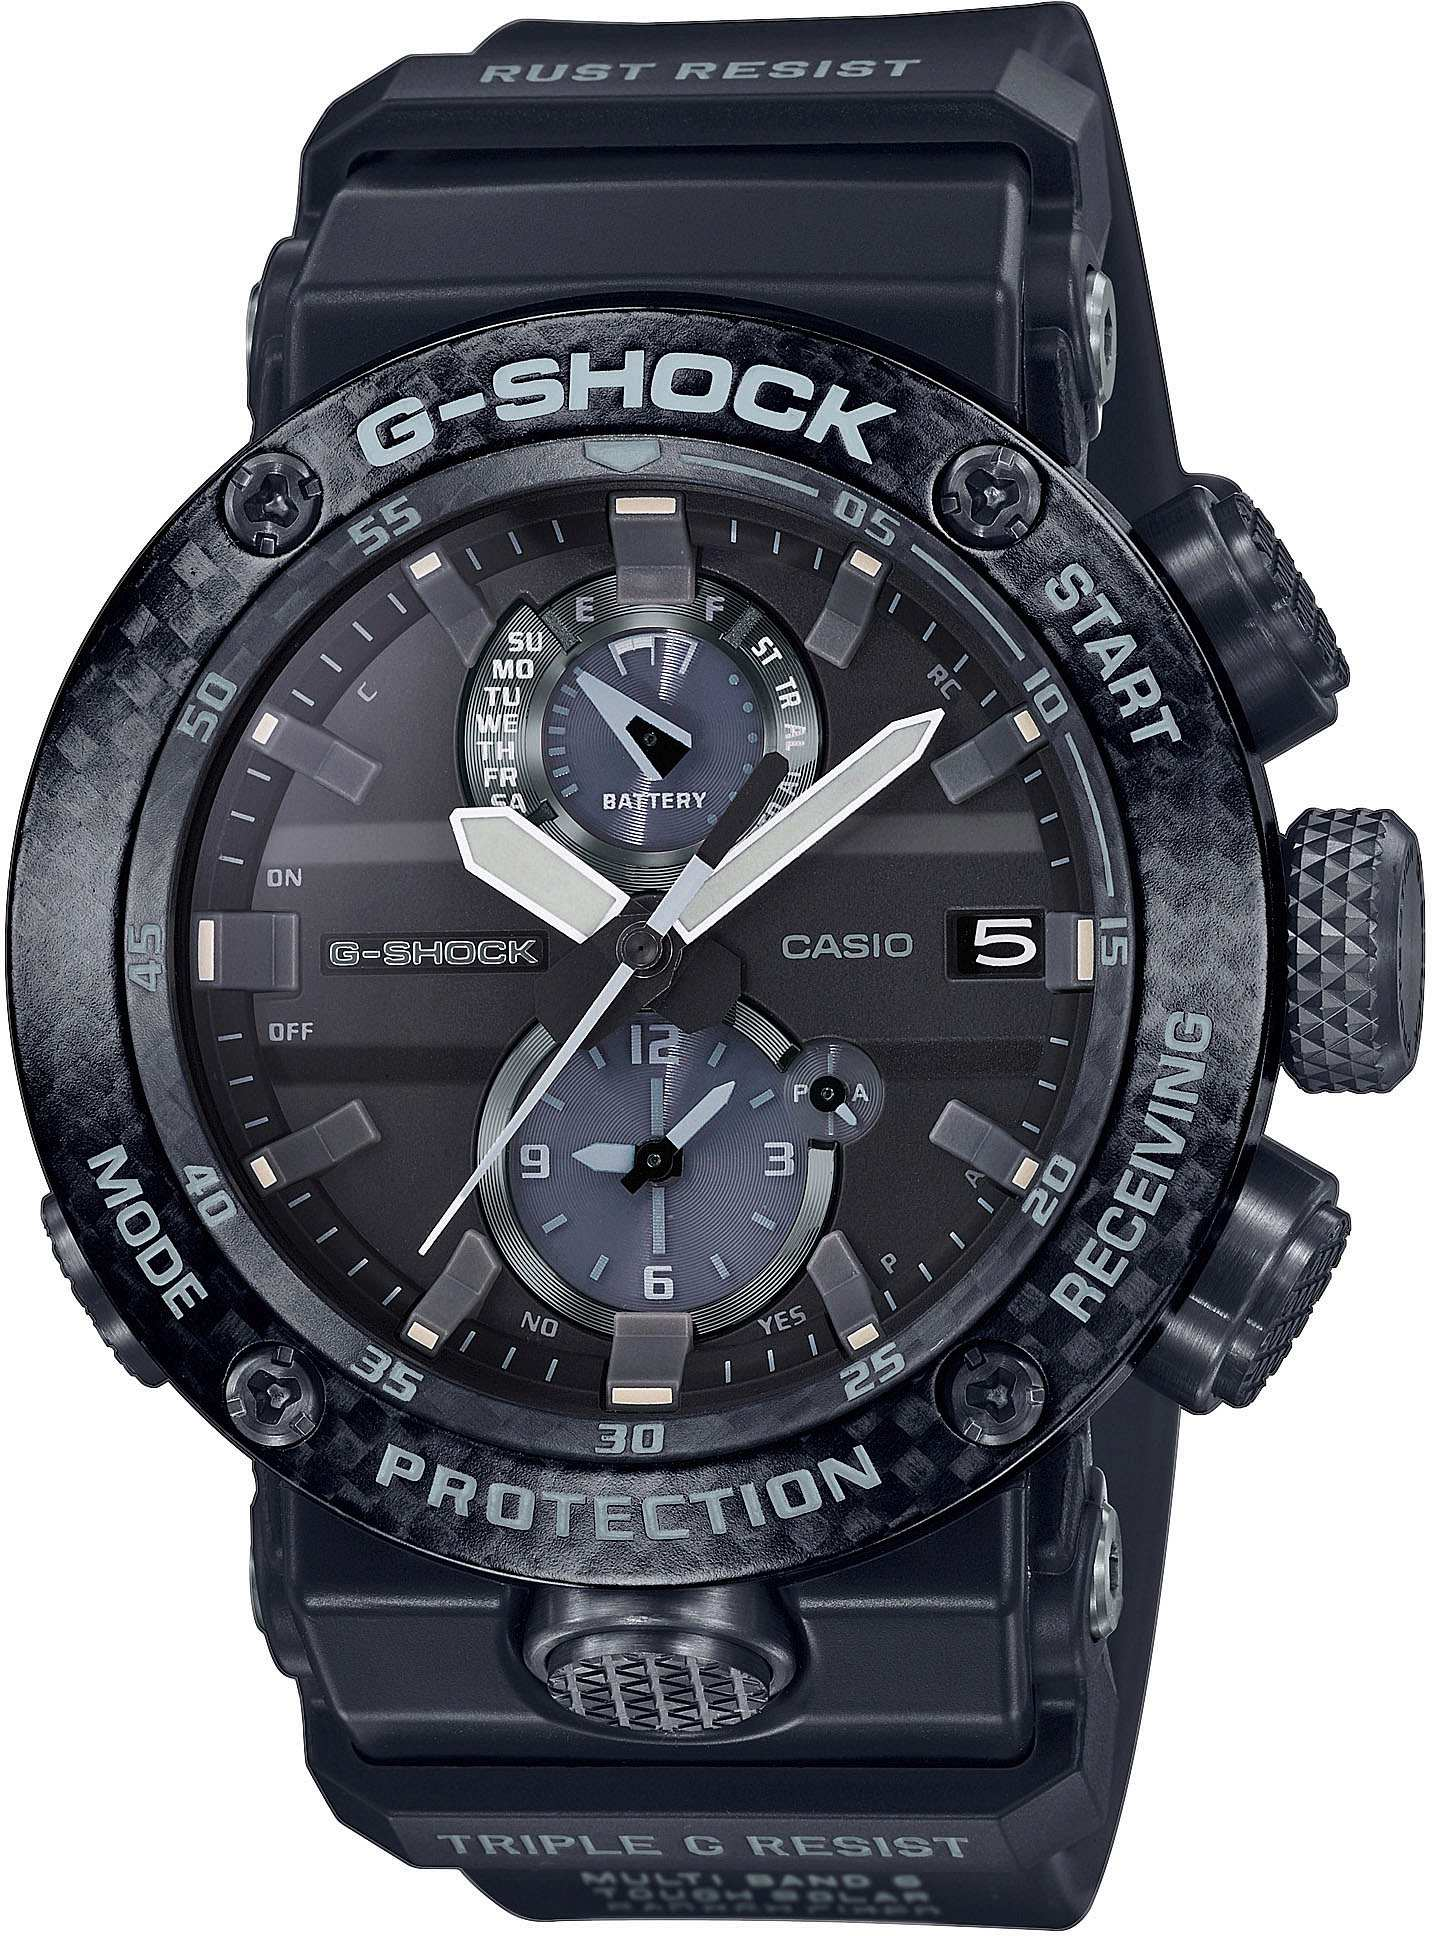 zegarek-meski-g-shock-gravitymaster-carbon-core-guard-bluetooth-solar-radio-controlled-gwr-b1000-1aerr